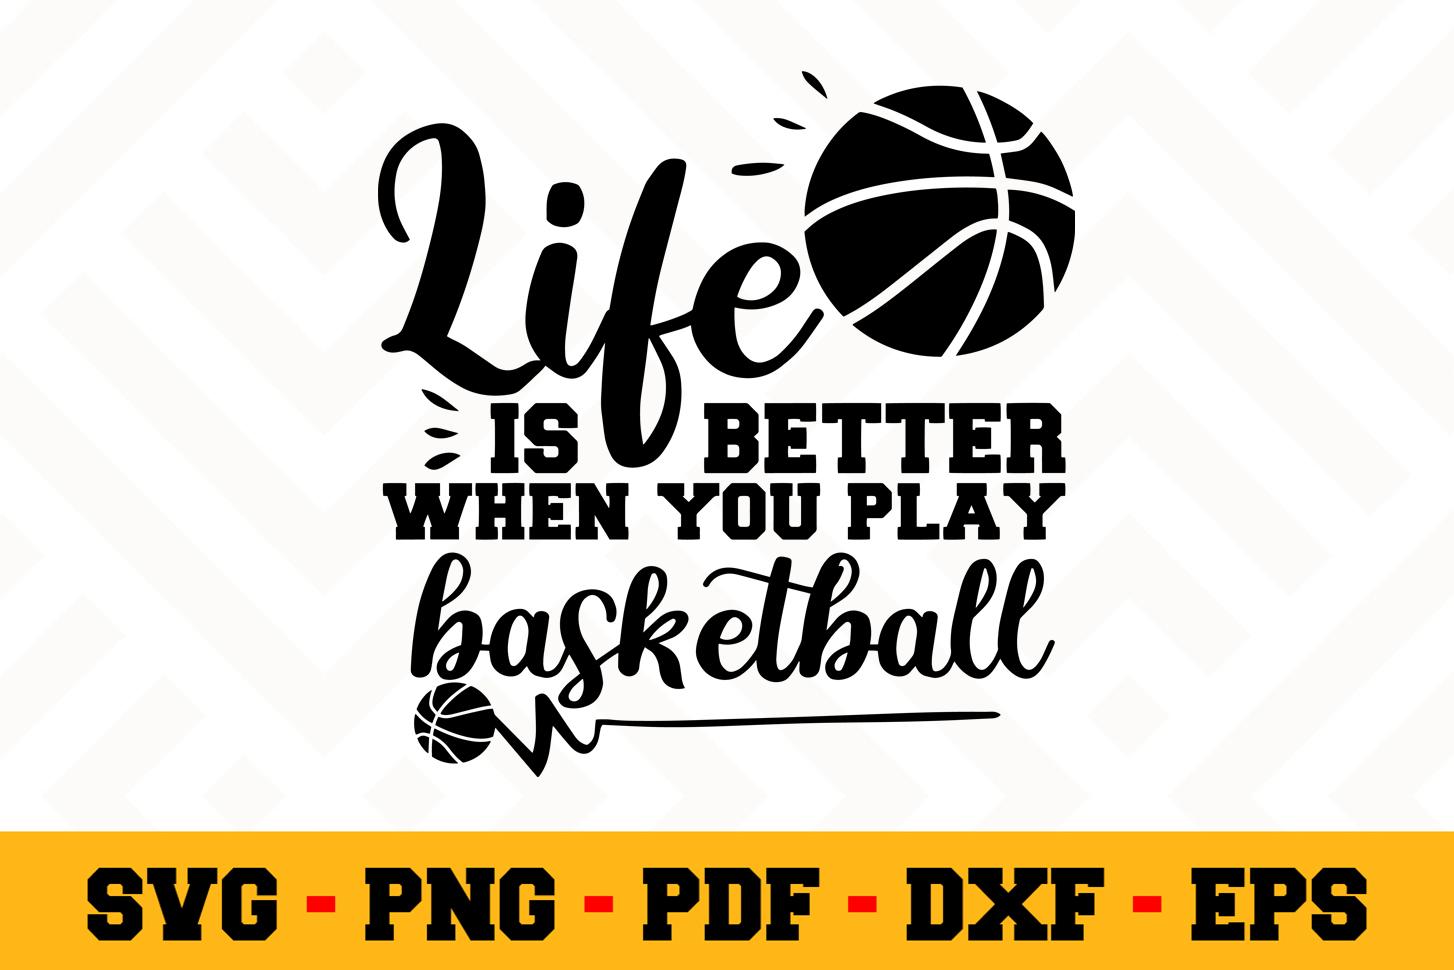 Basketball SVG Design n576 | Basketball SVG Cut File example image 1